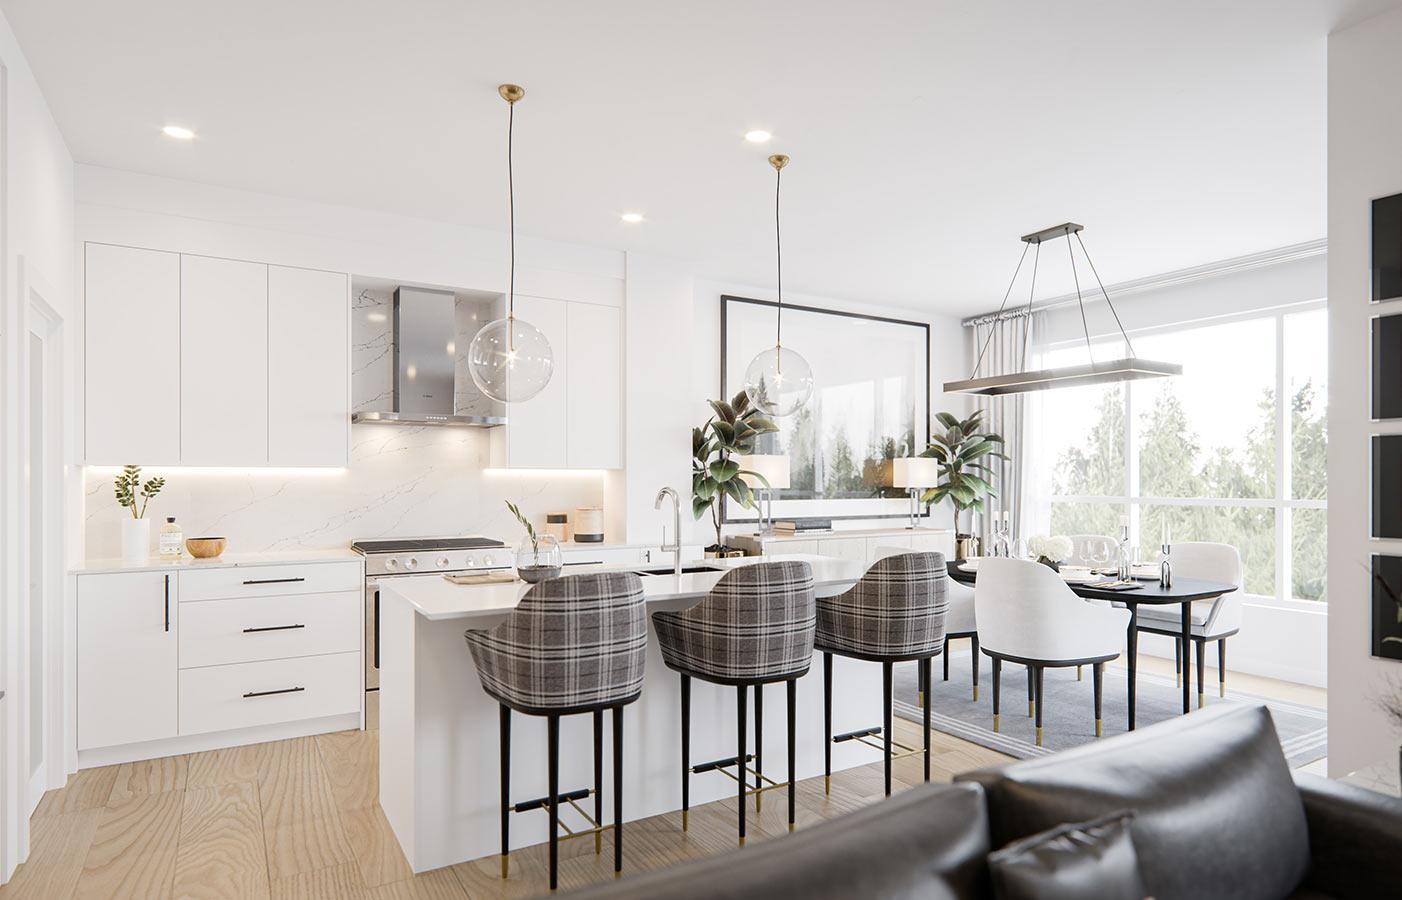 All white open layout kitchen